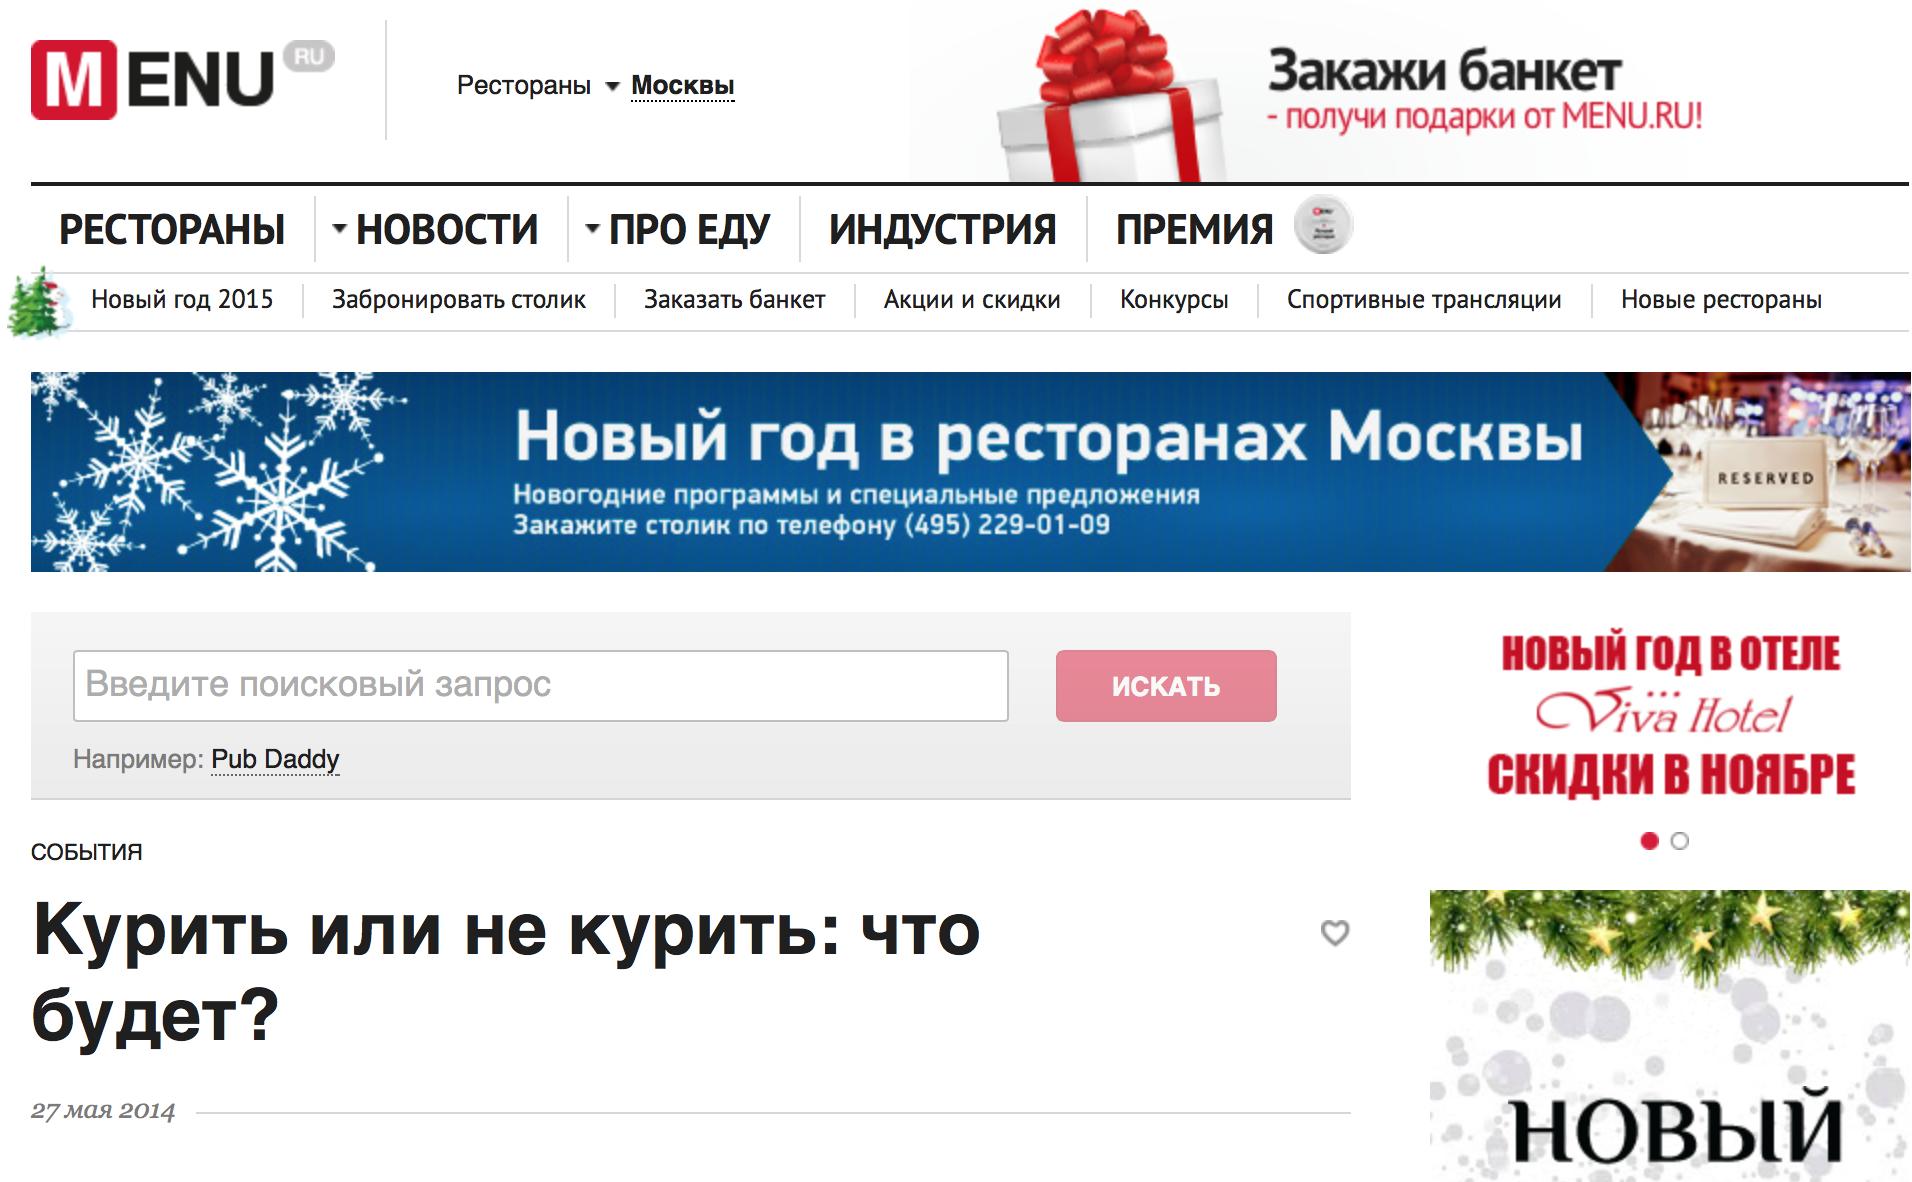 Menu.ru, май 2014